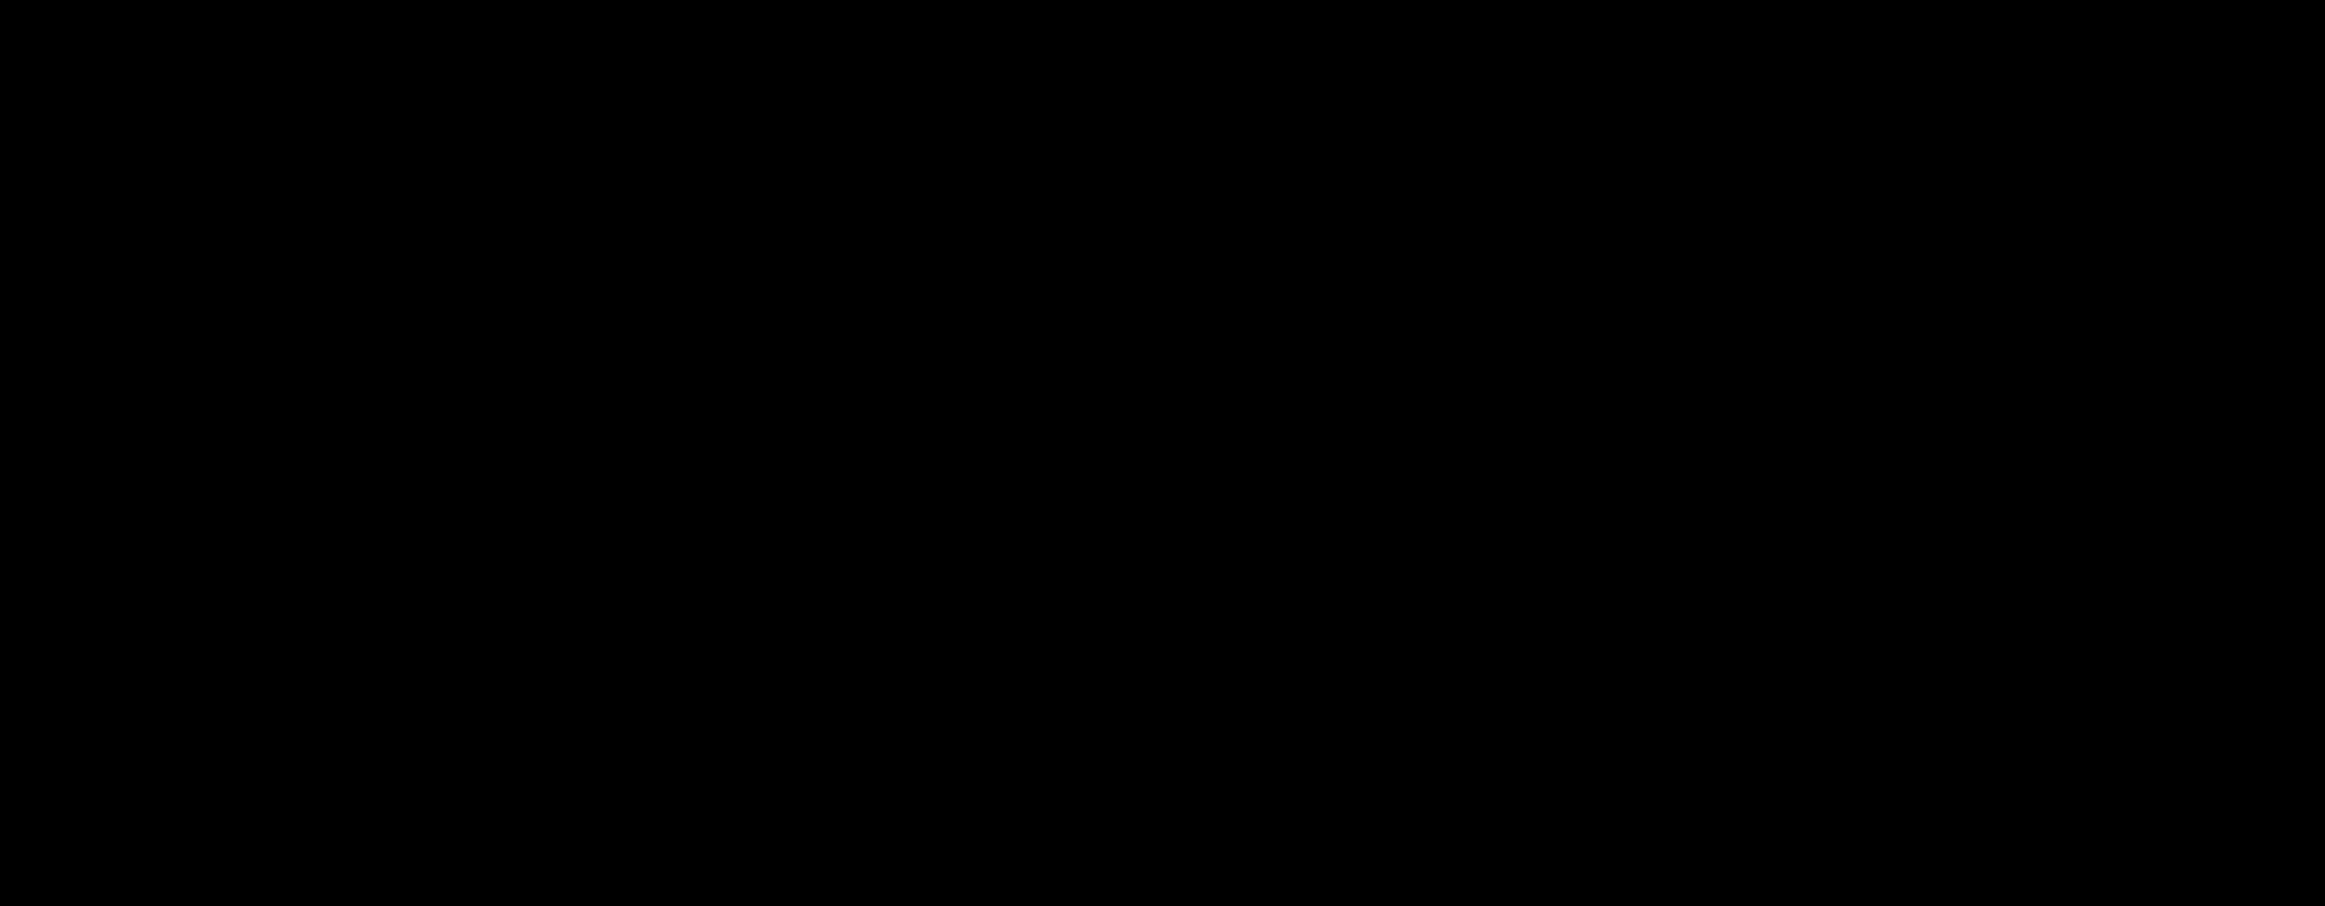 Moniker logo2